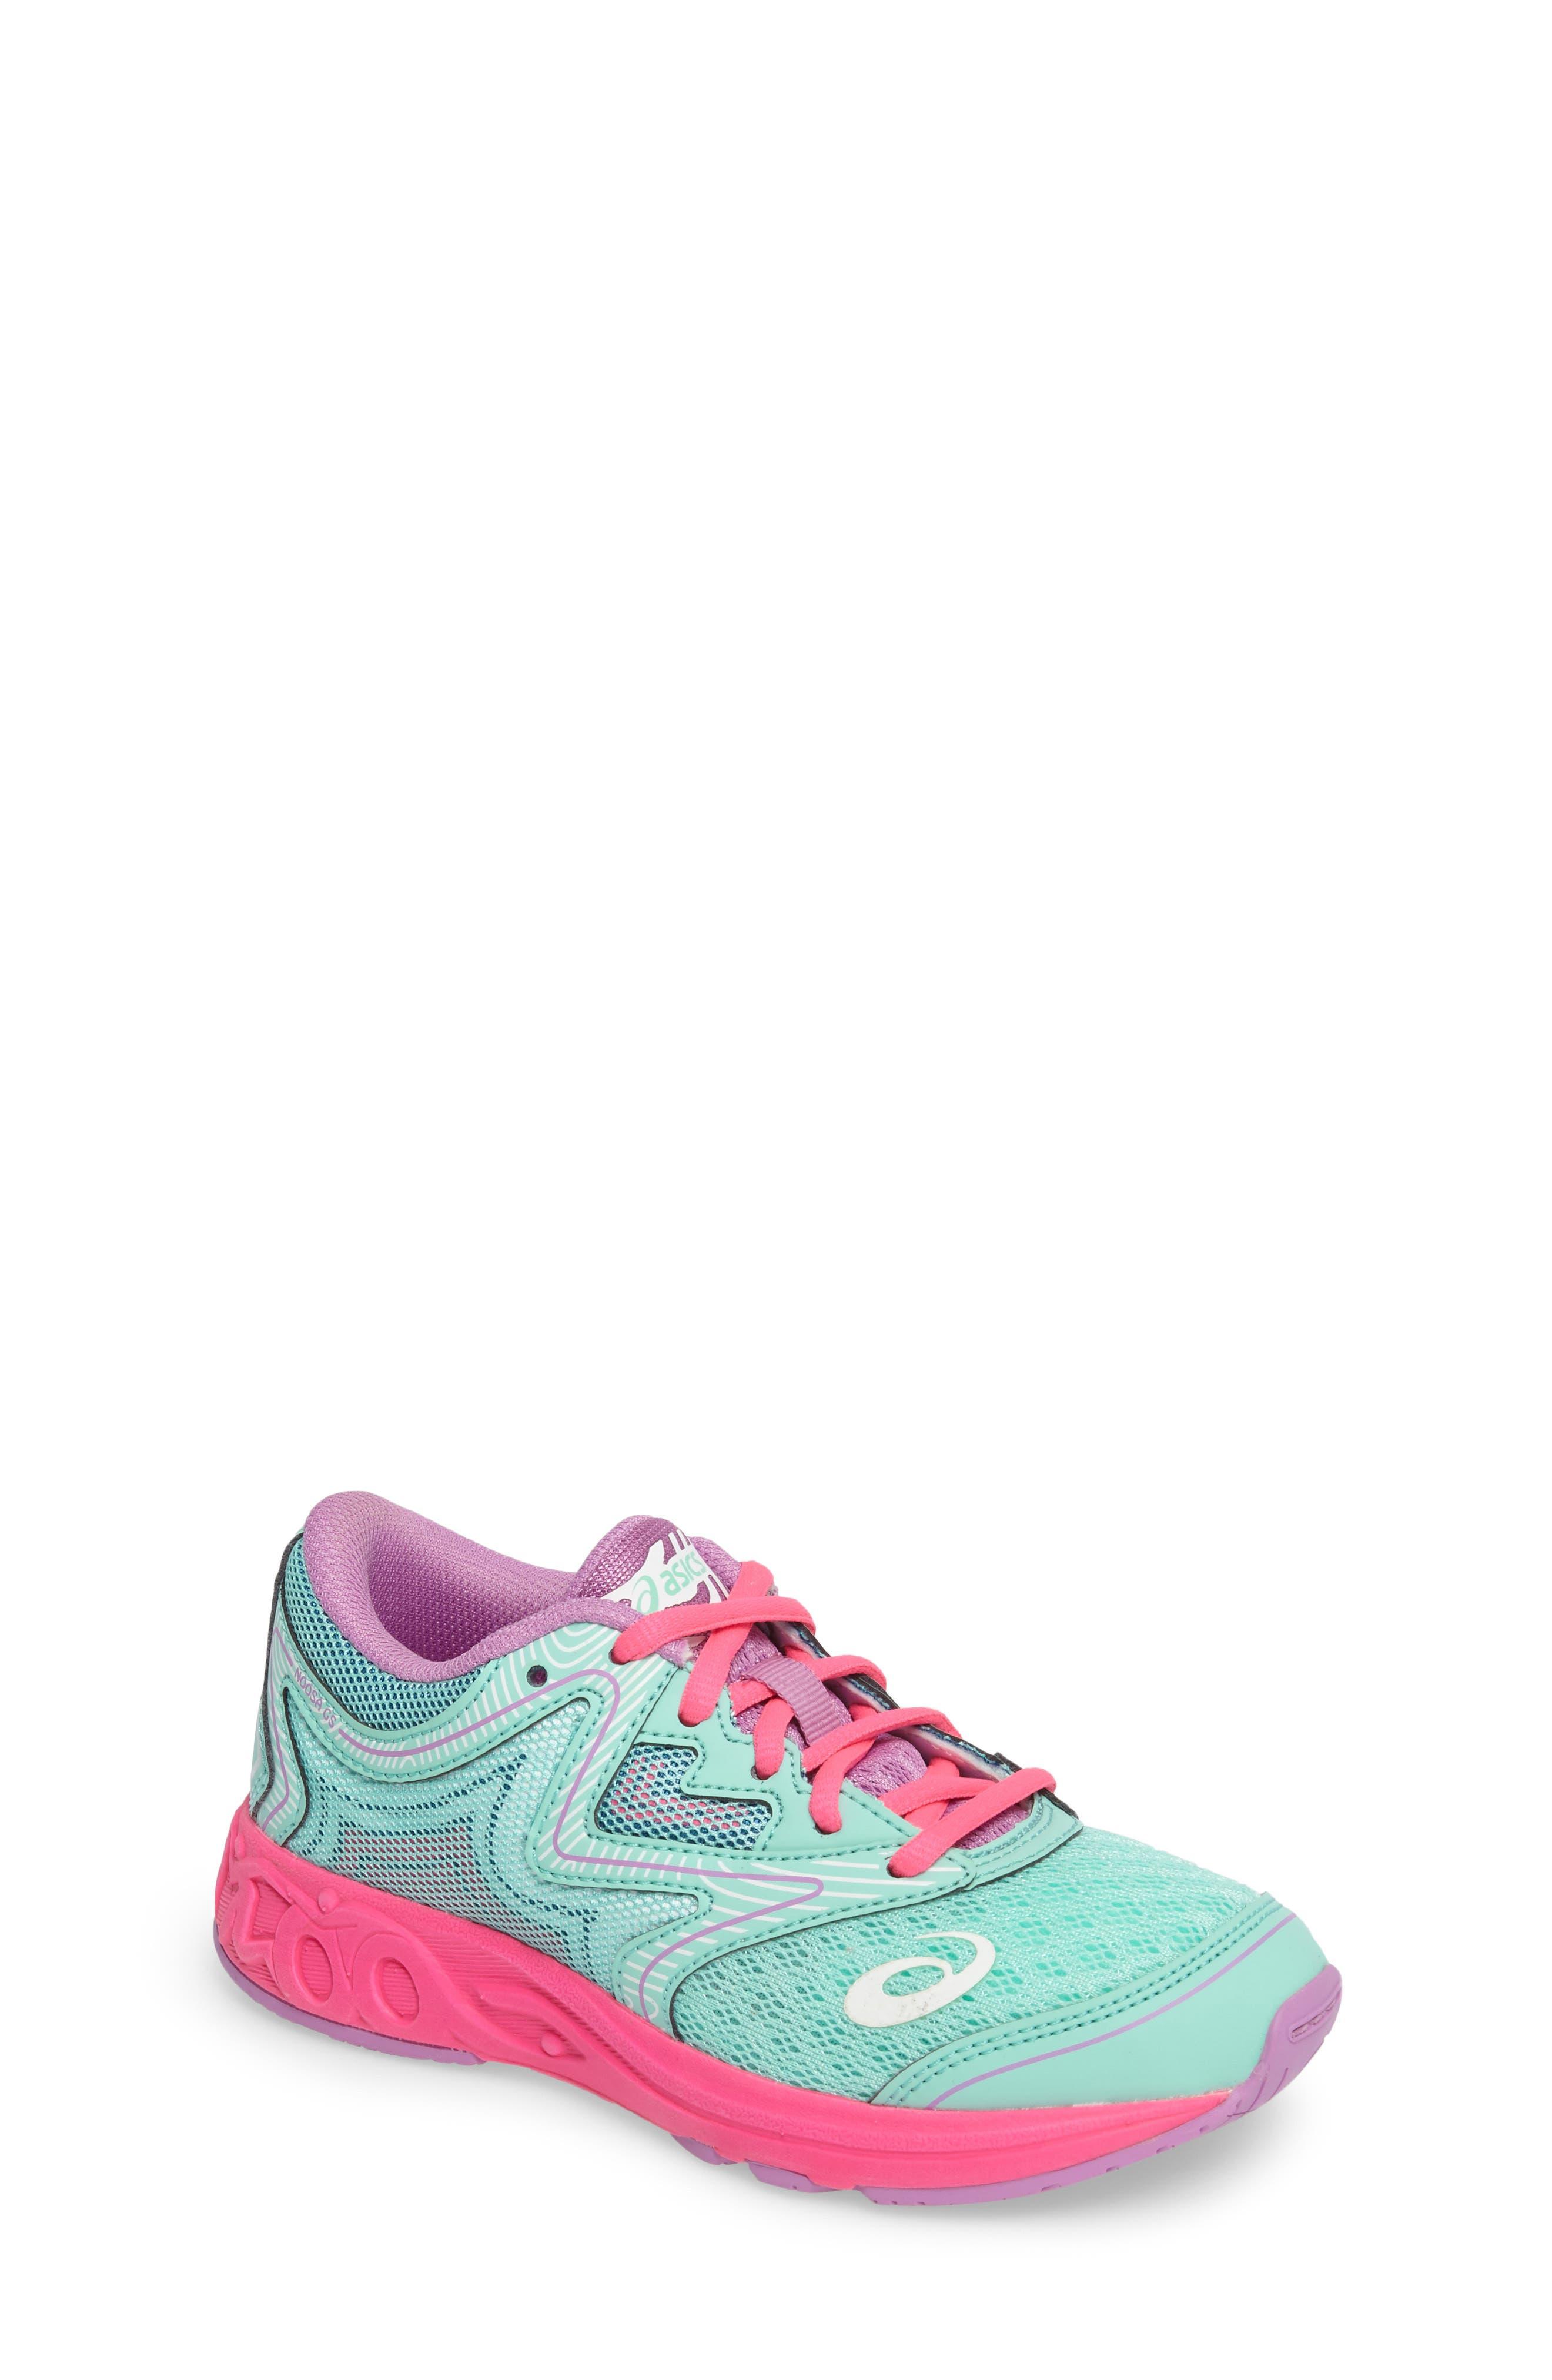 Noosa GS Sneaker,                             Main thumbnail 1, color,                             330